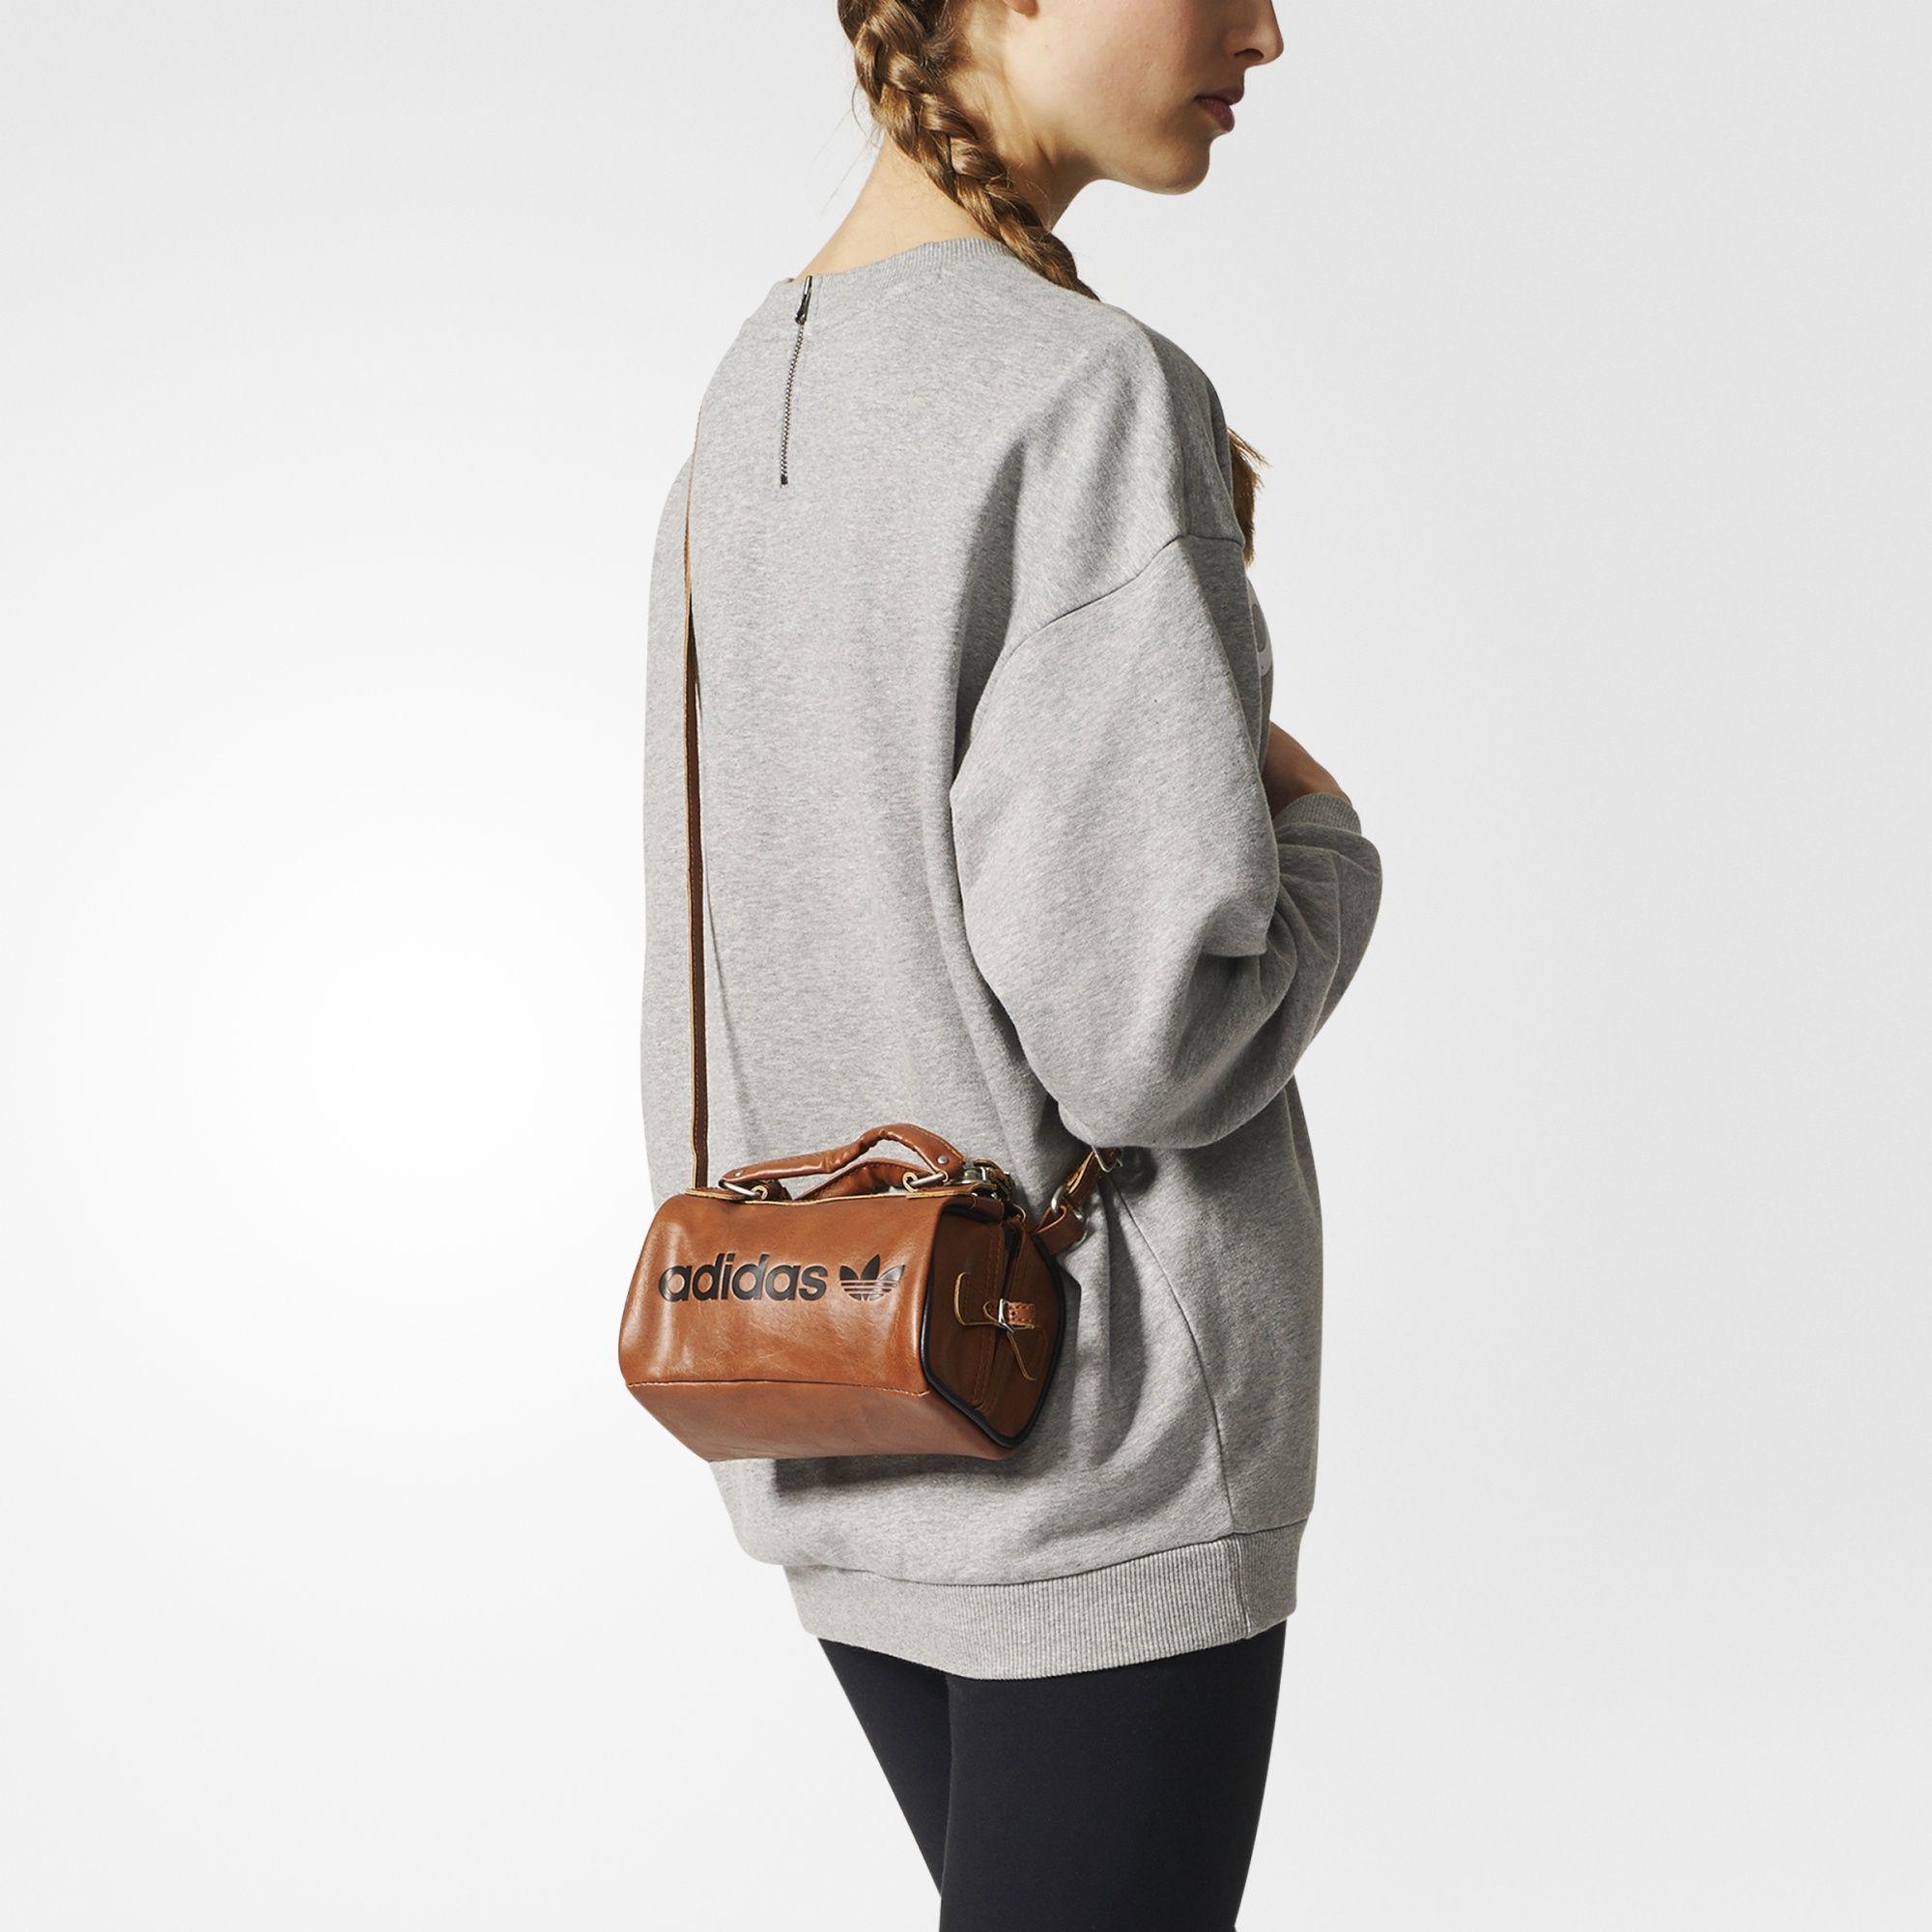 34d2310d093 adidas - Torba Spezial Archive Bag Adidas Bags, Adidas Spezial, Yoga Bag,  Duffel